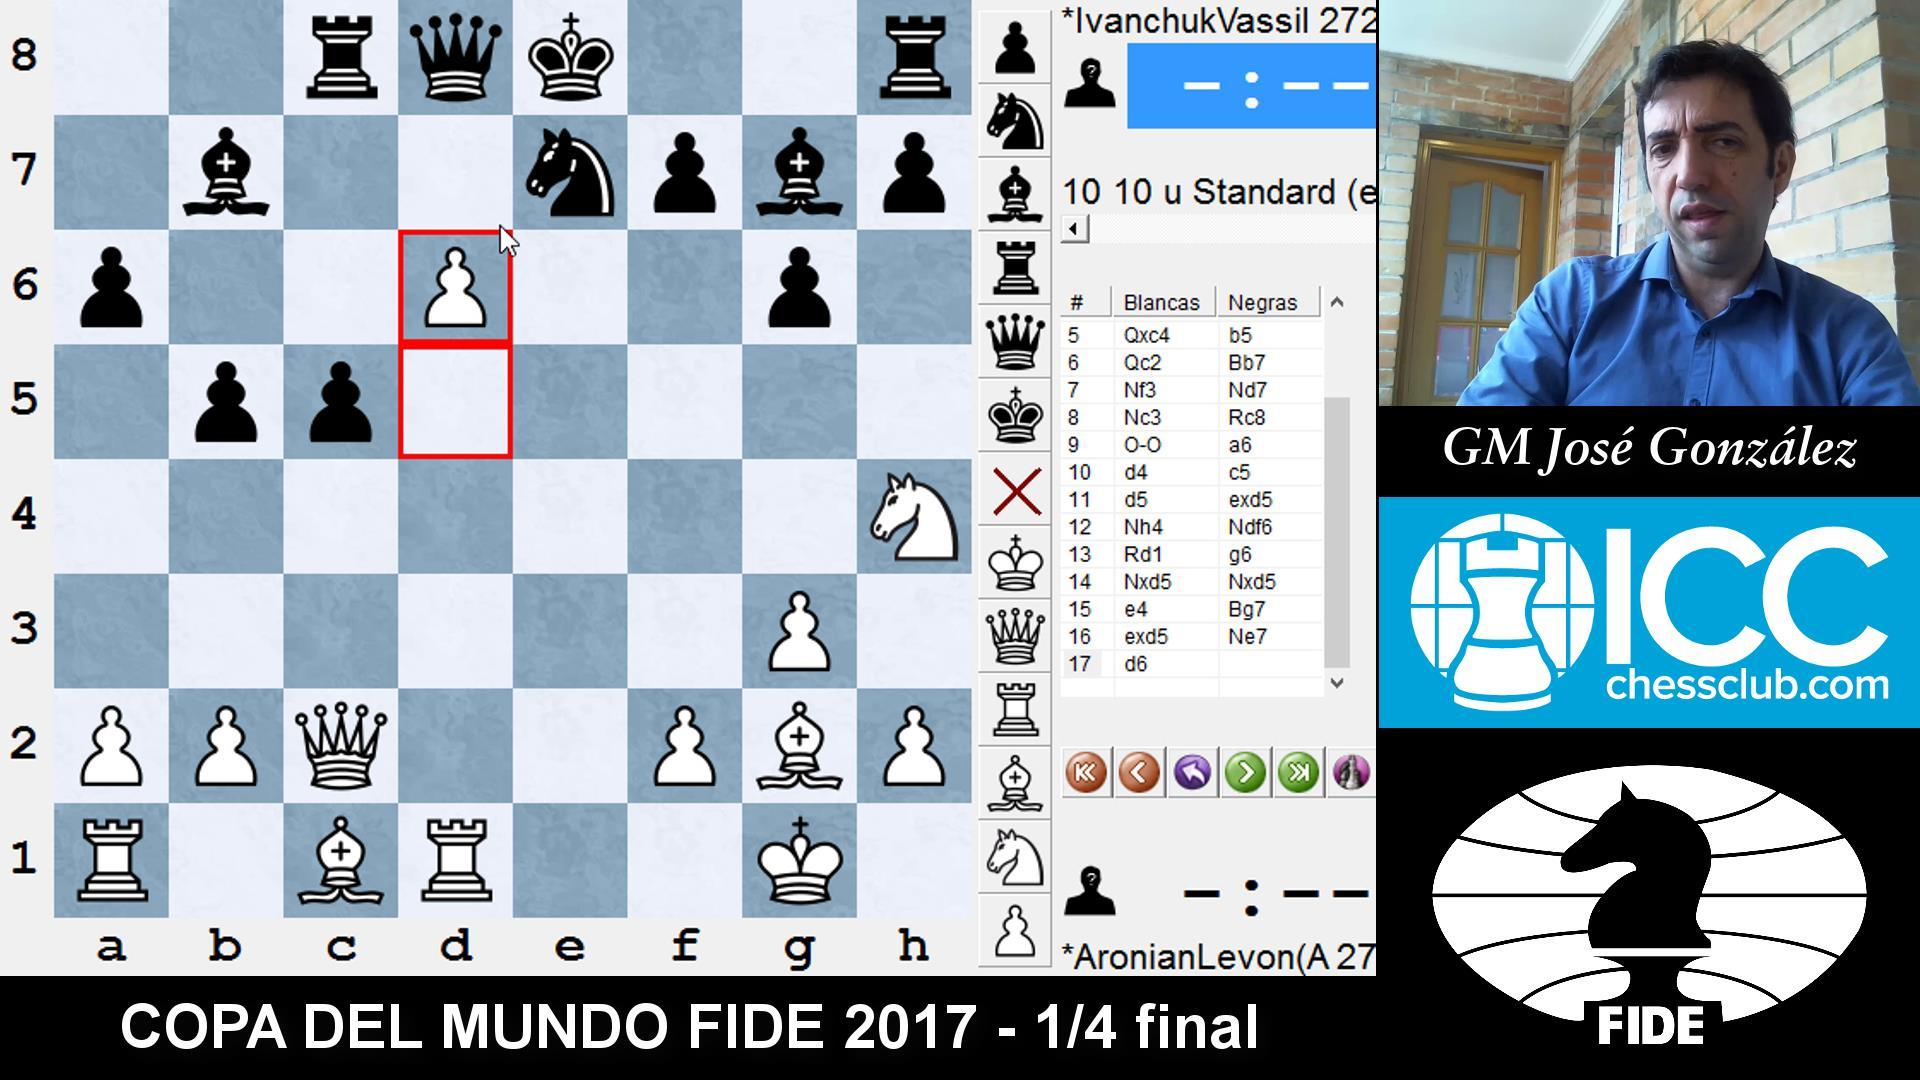 COPA DEL MUNDO FIDE 2017 - Resumen 1/4 final (GM José González)